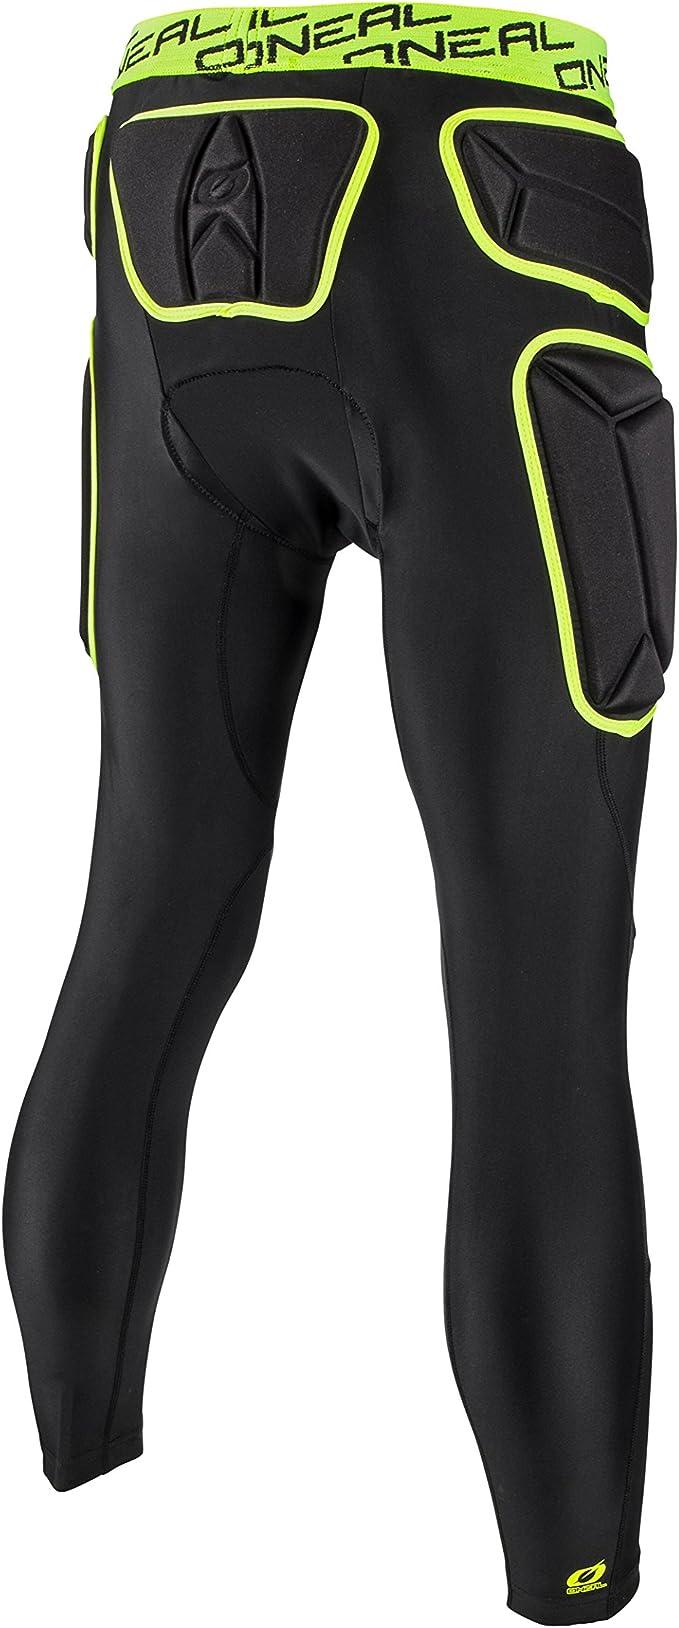 Xl , Vert Pantalon De Protection Mx Oneal 2018 Trail Lime-Noir